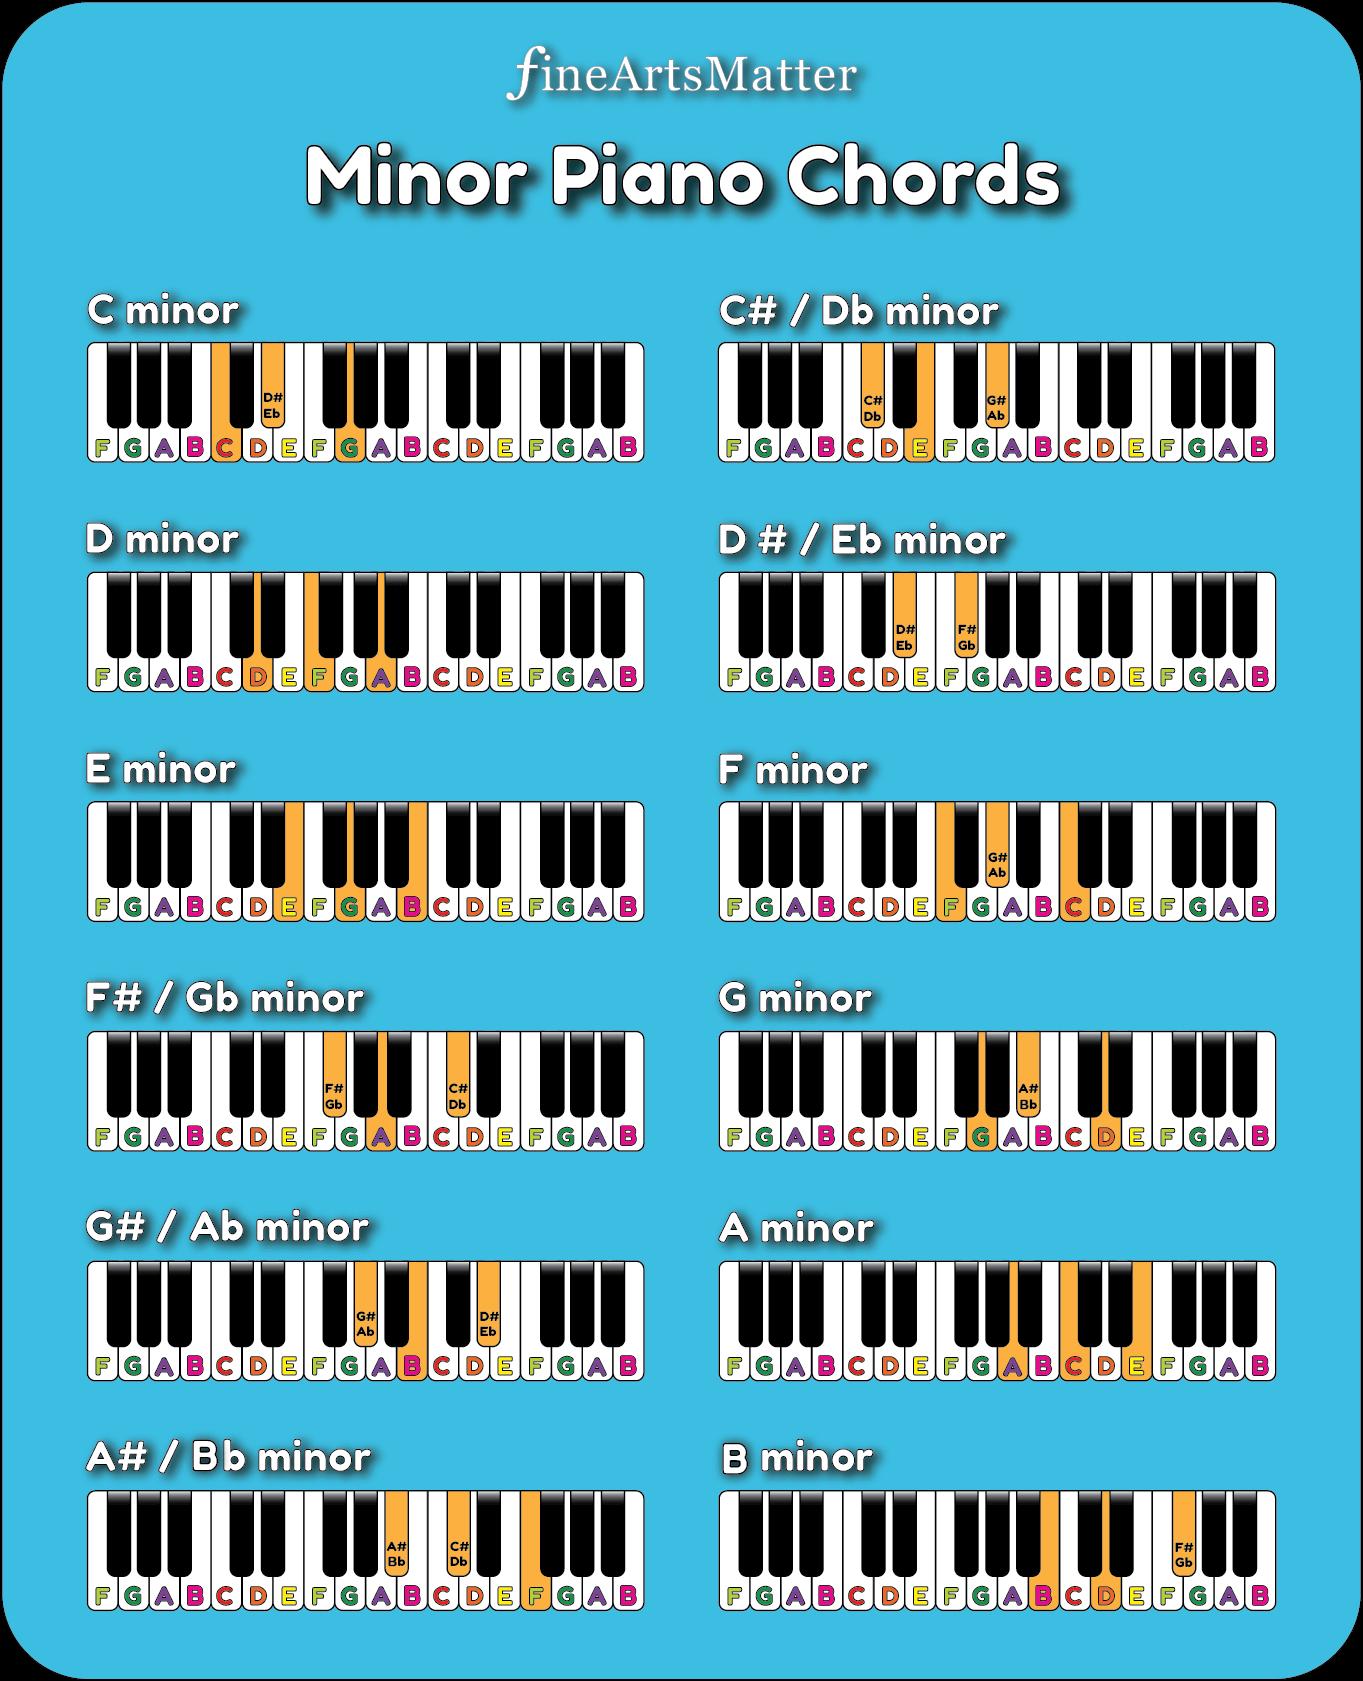 full chart of minor piano chords